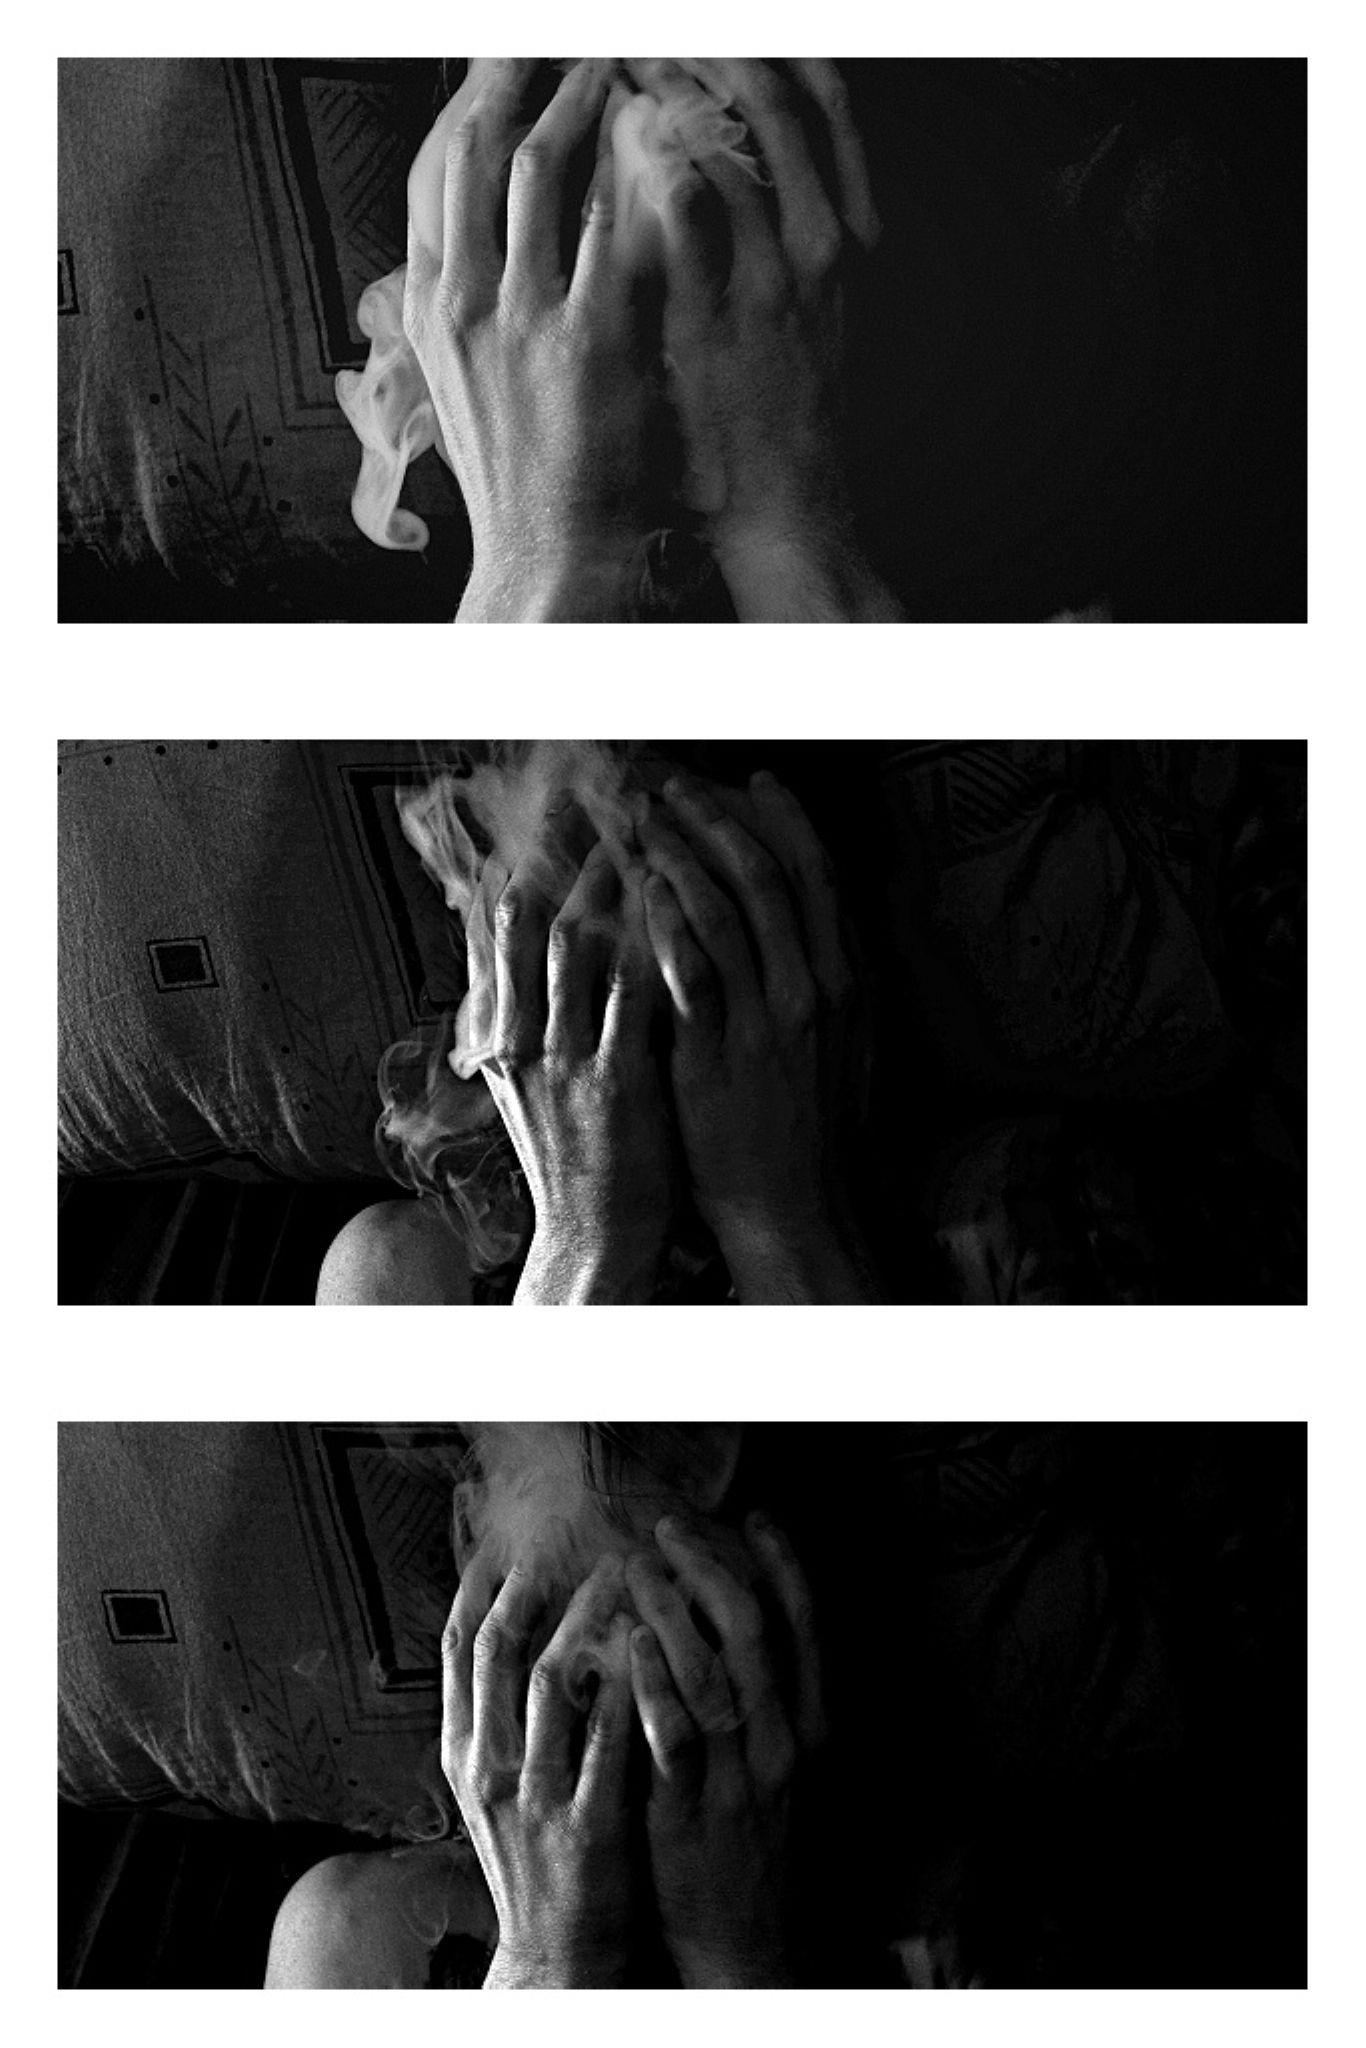 what feeling or emotions? by michaela.walkova